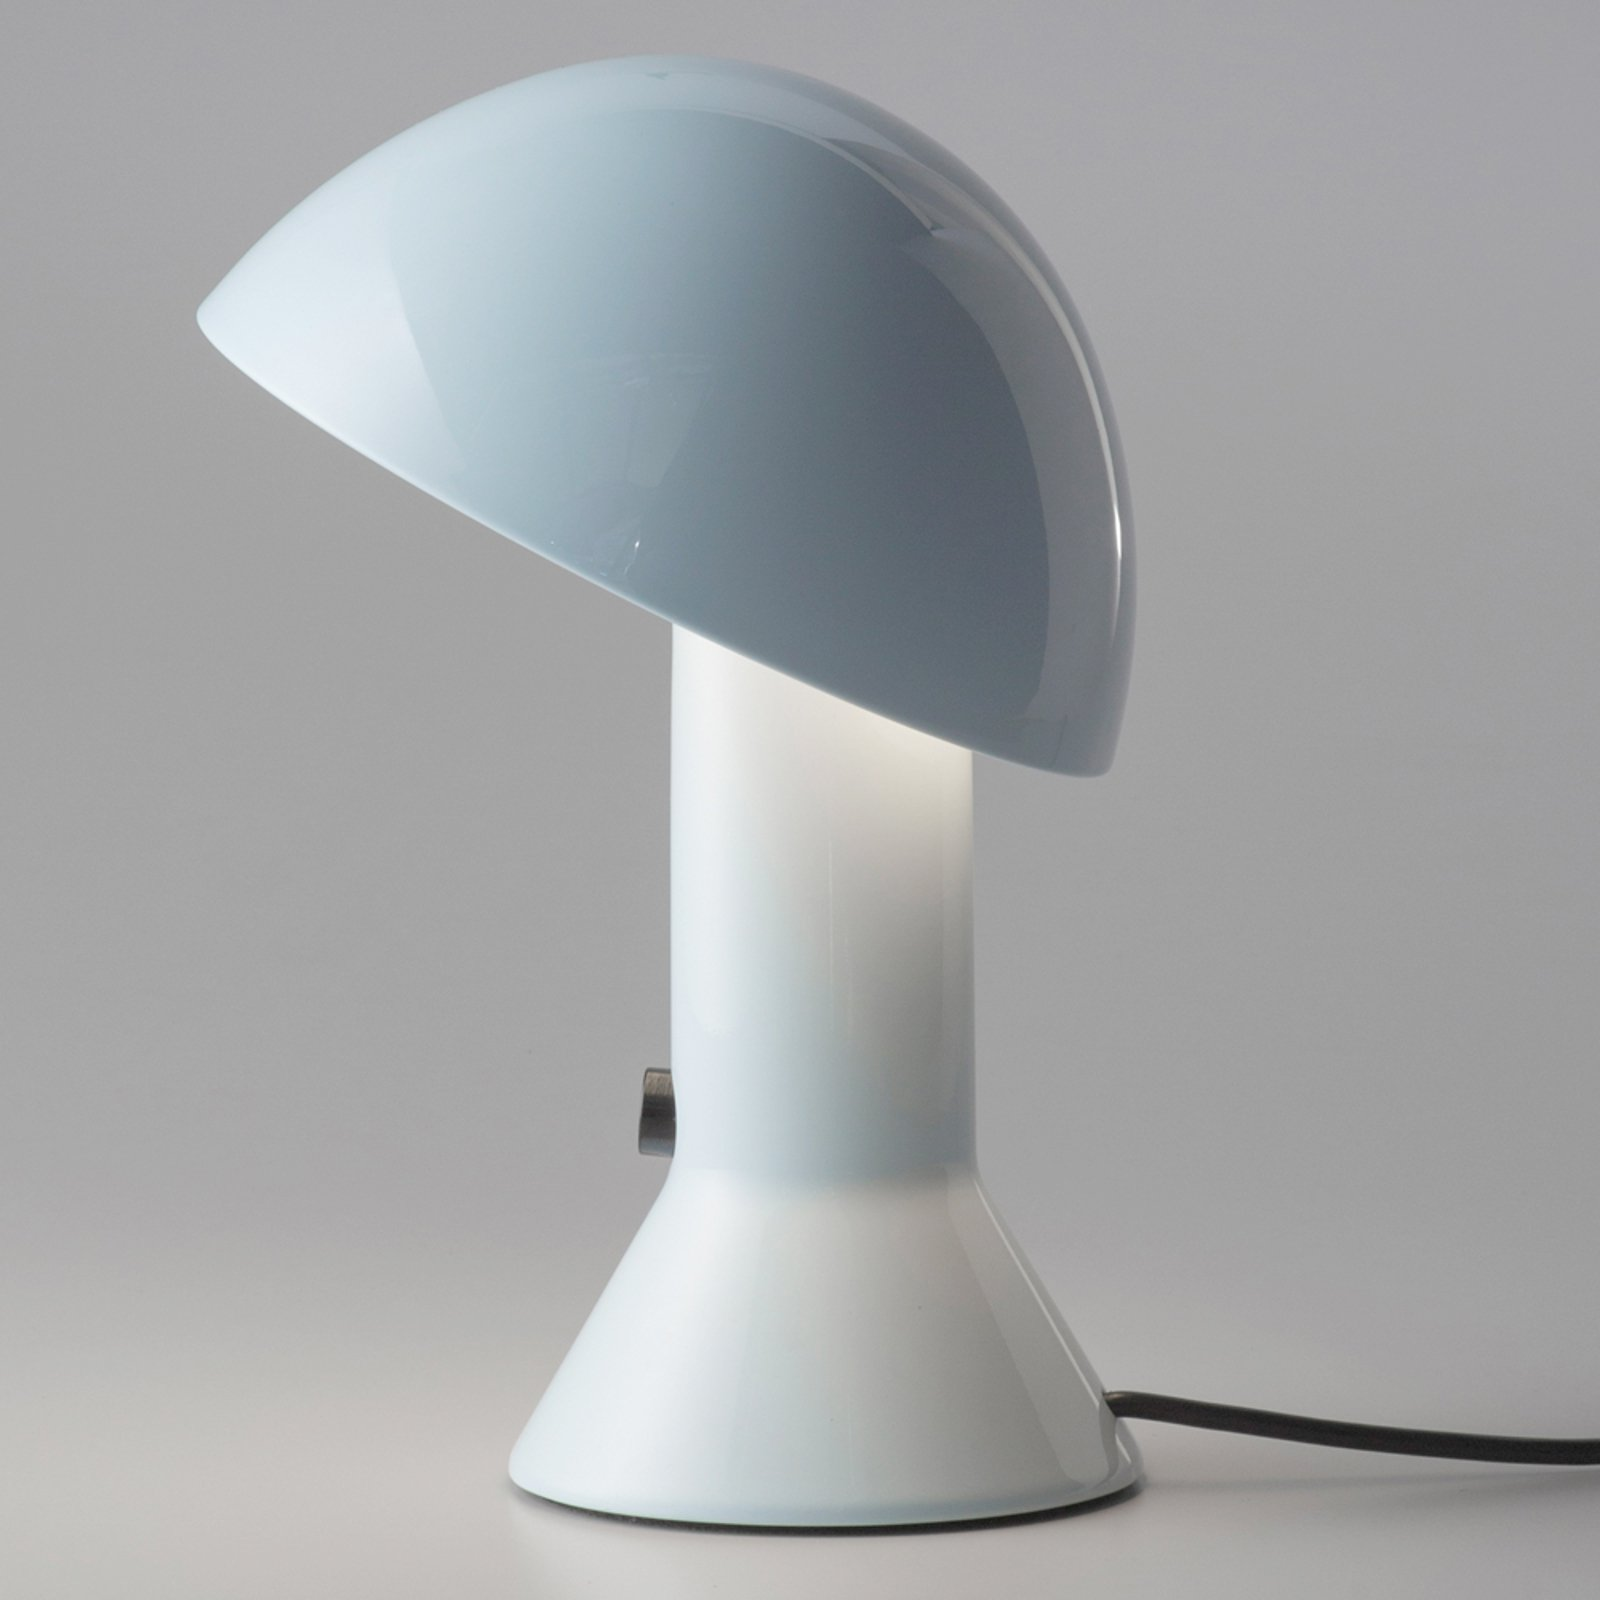 Martinelli Luce Elmetto - bordlampe, lyseblå